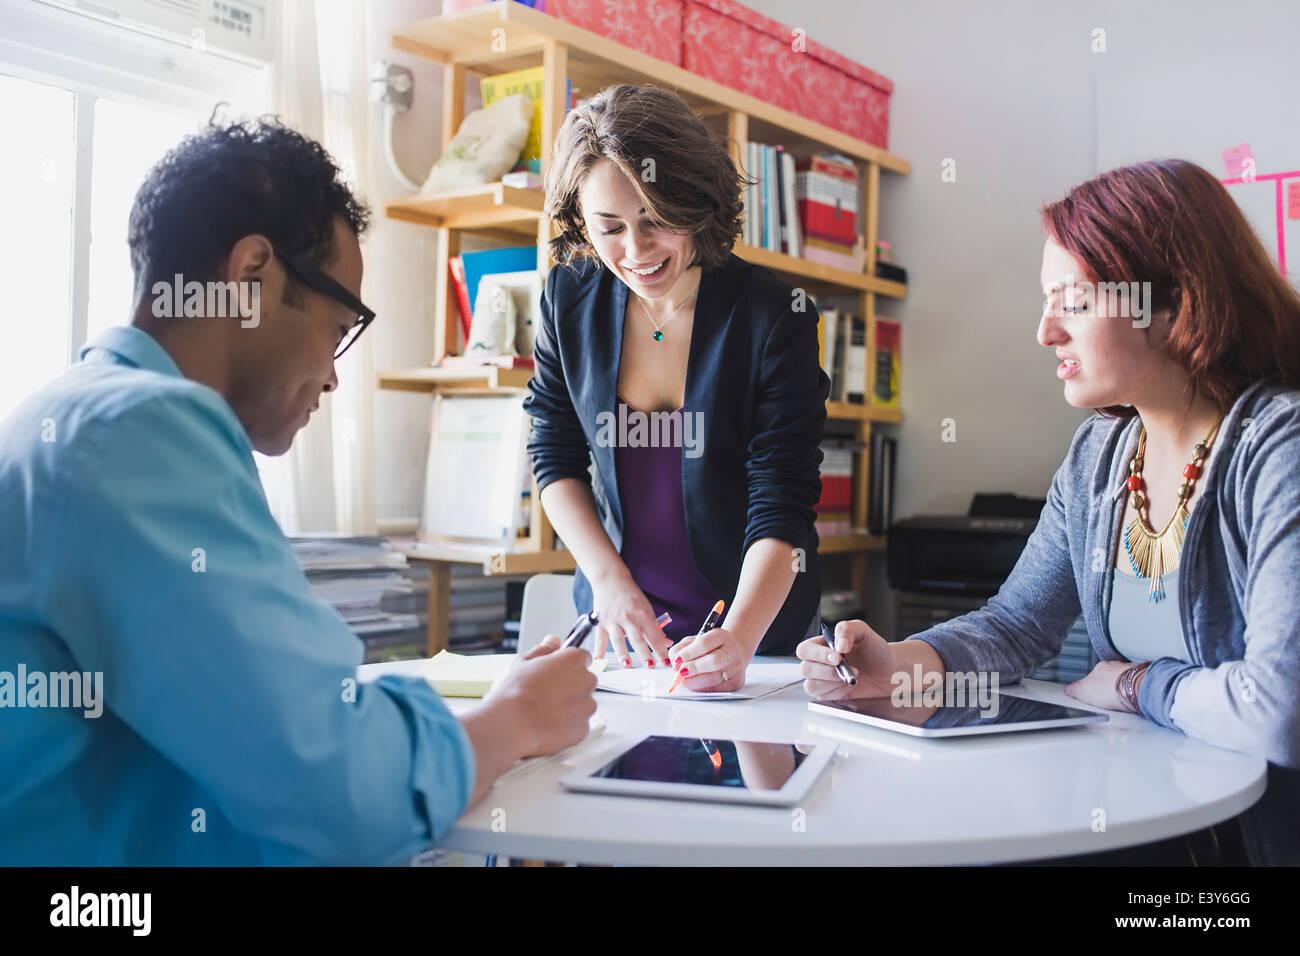 Jeune femme conduisant petite réunion Photo Stock